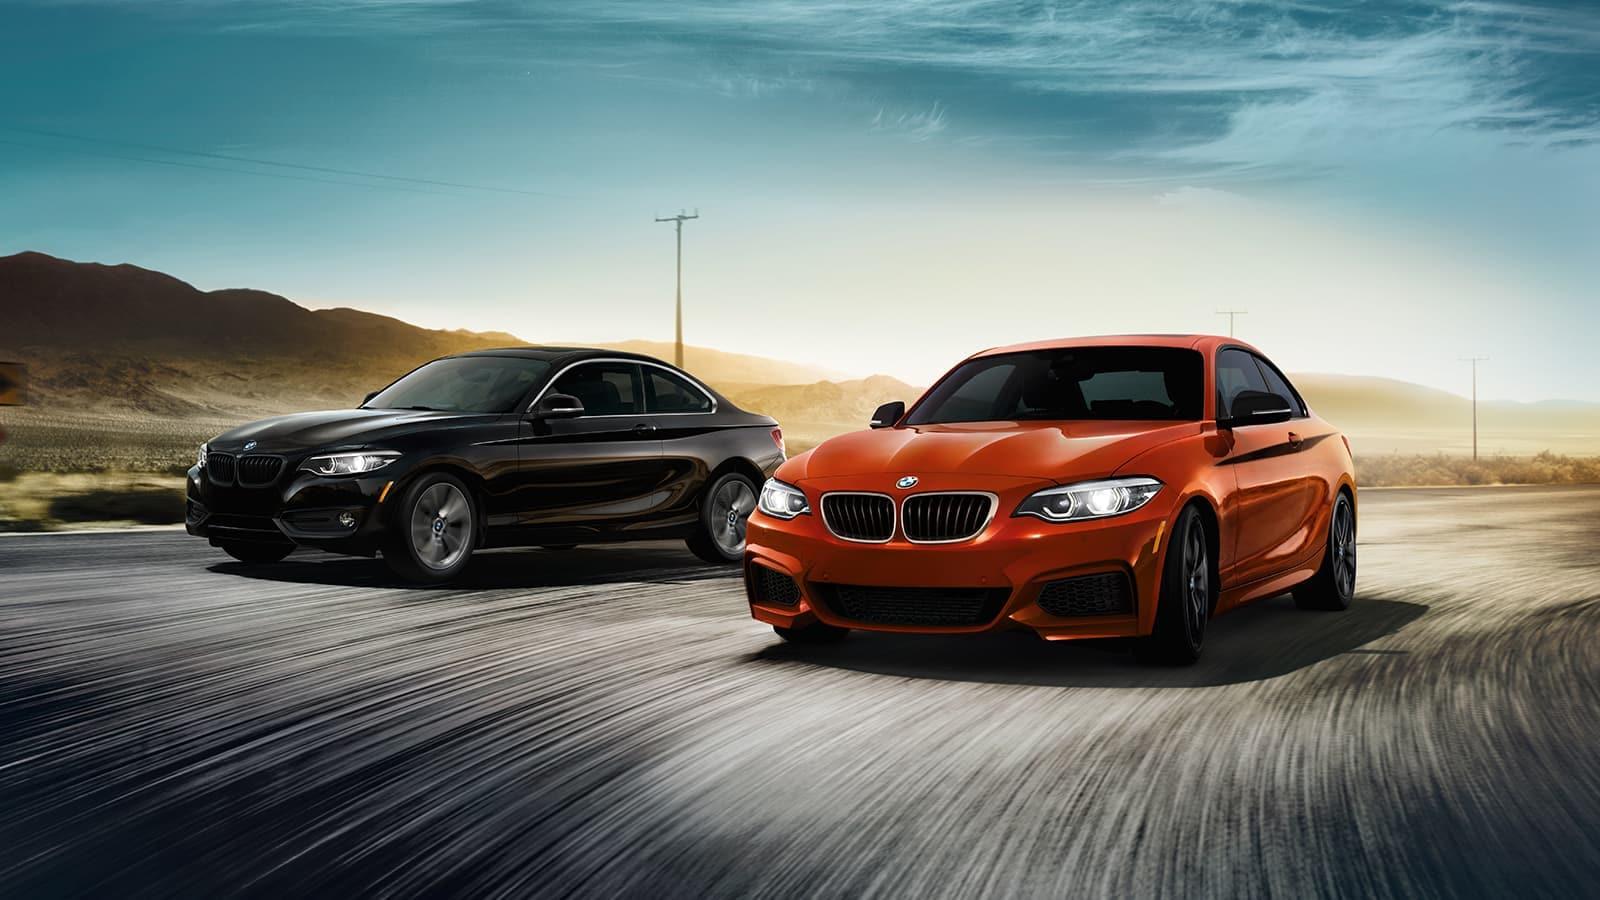 BMW 2 Series 230i Coupe: Sports Car with Aerodynamic Design - DAX Street